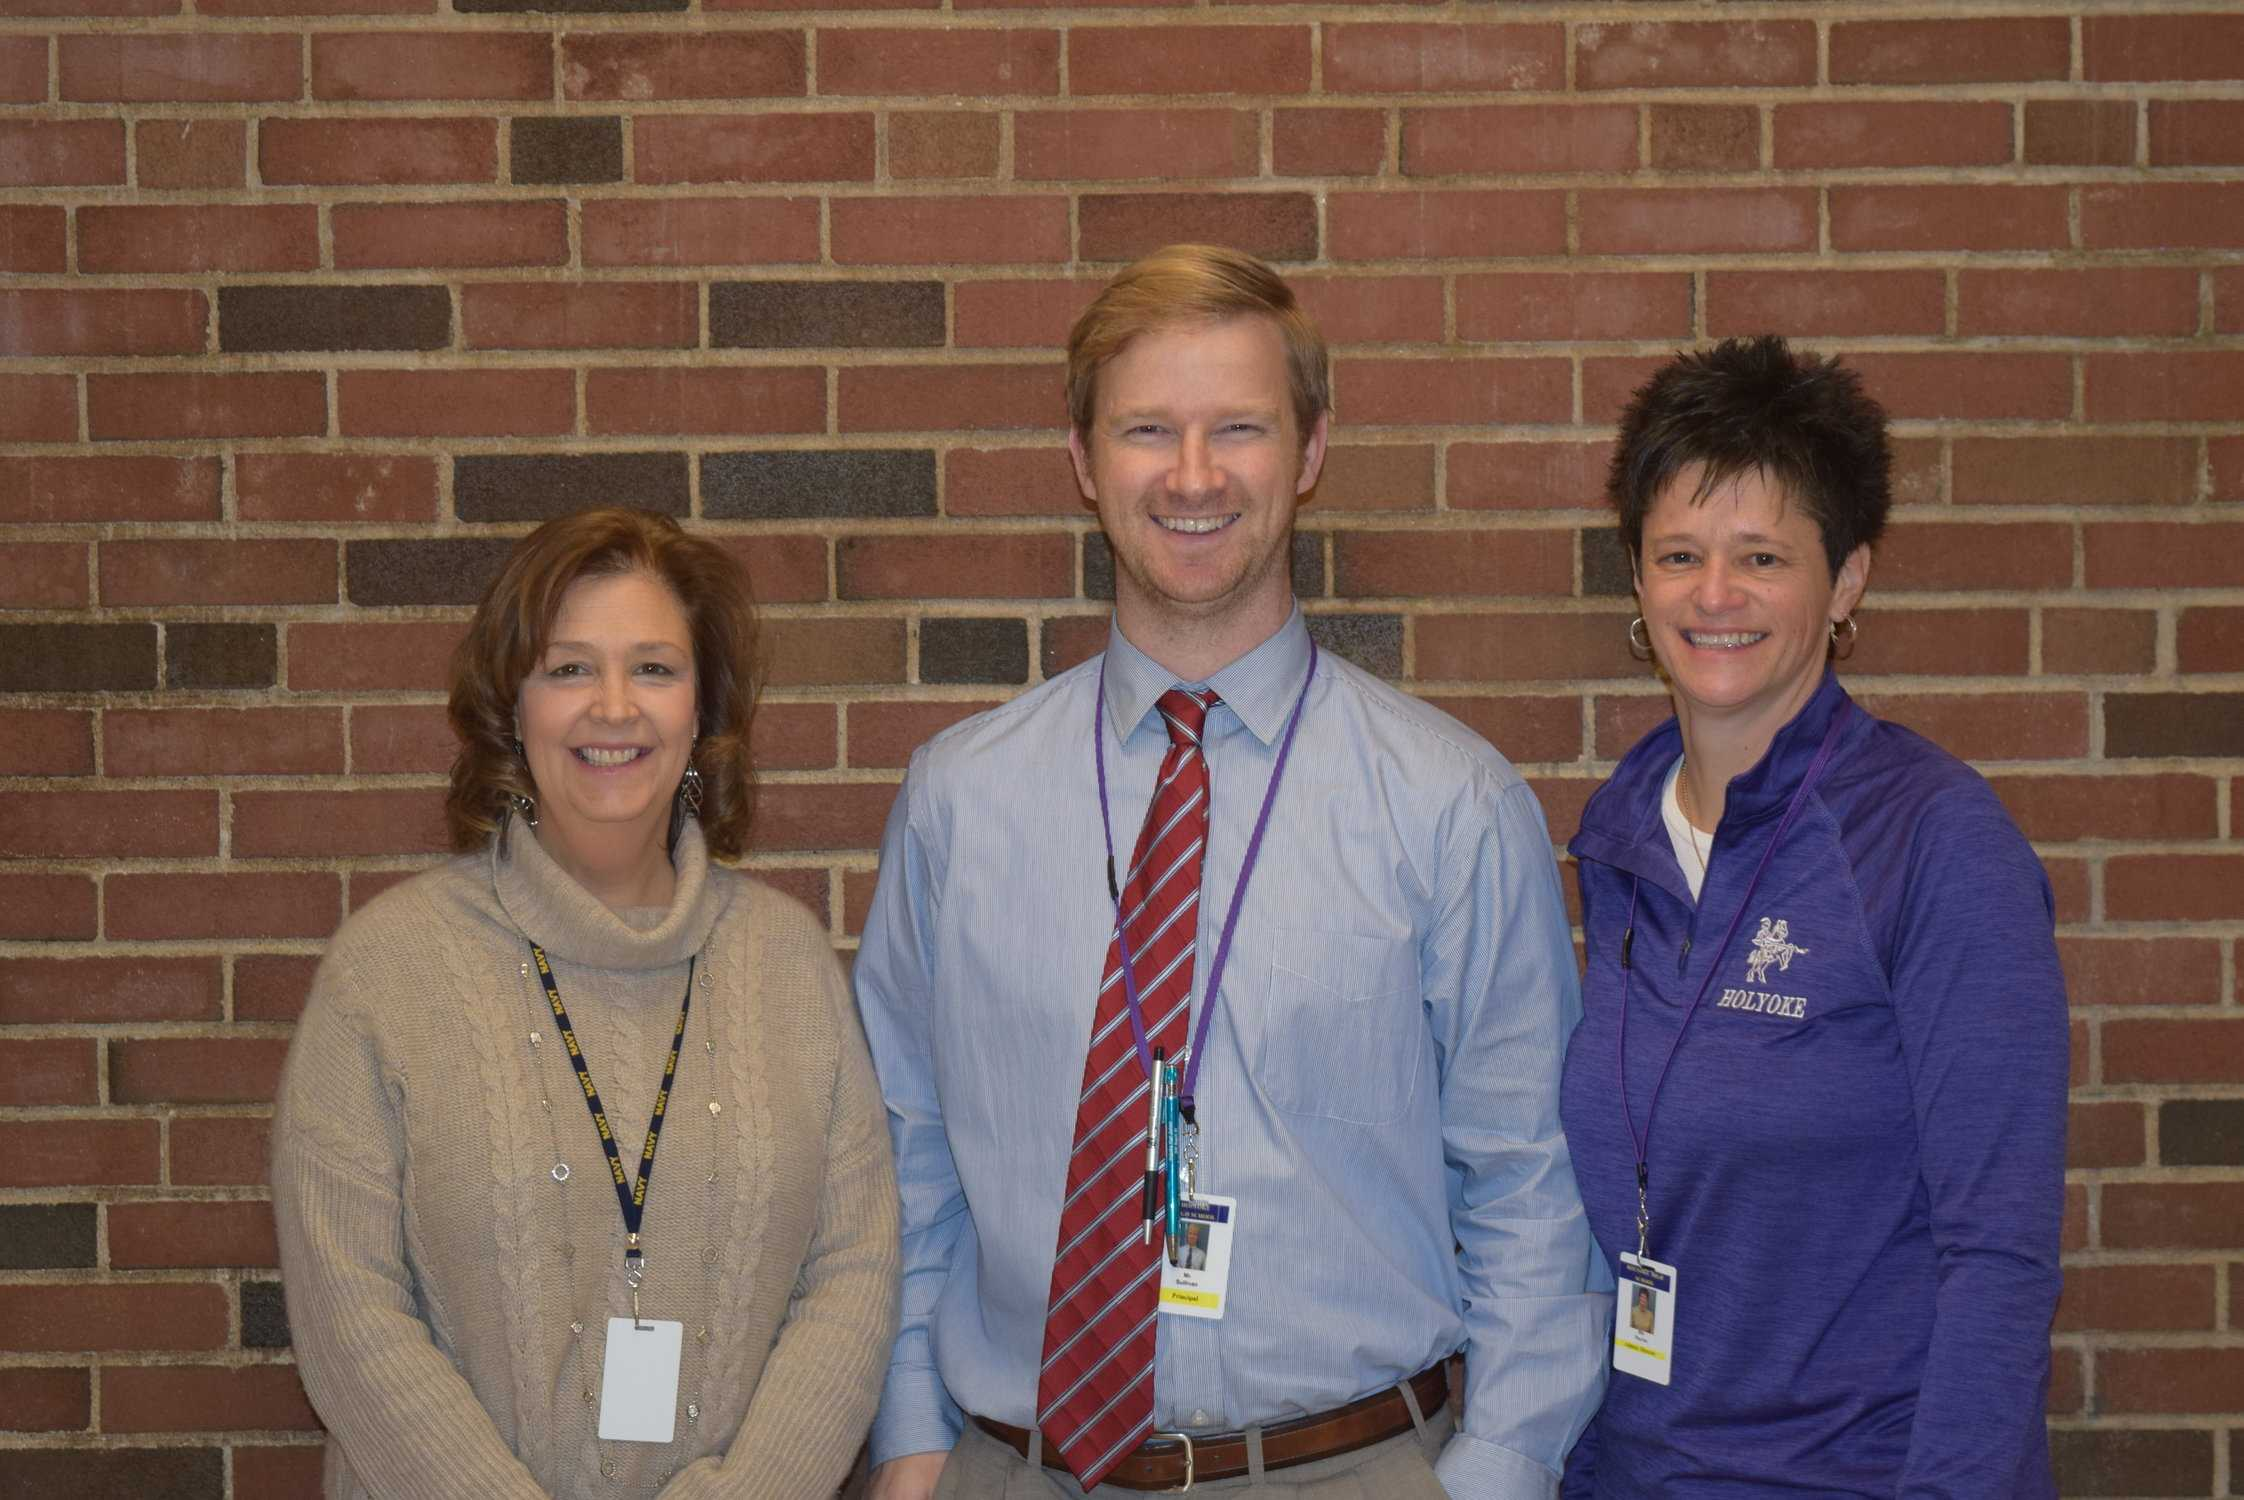 Mrs. Reardon, Principal Stephen Sullivan, and Athletic Director Melanie Martin (Photo Credits to Brendan Leahy)